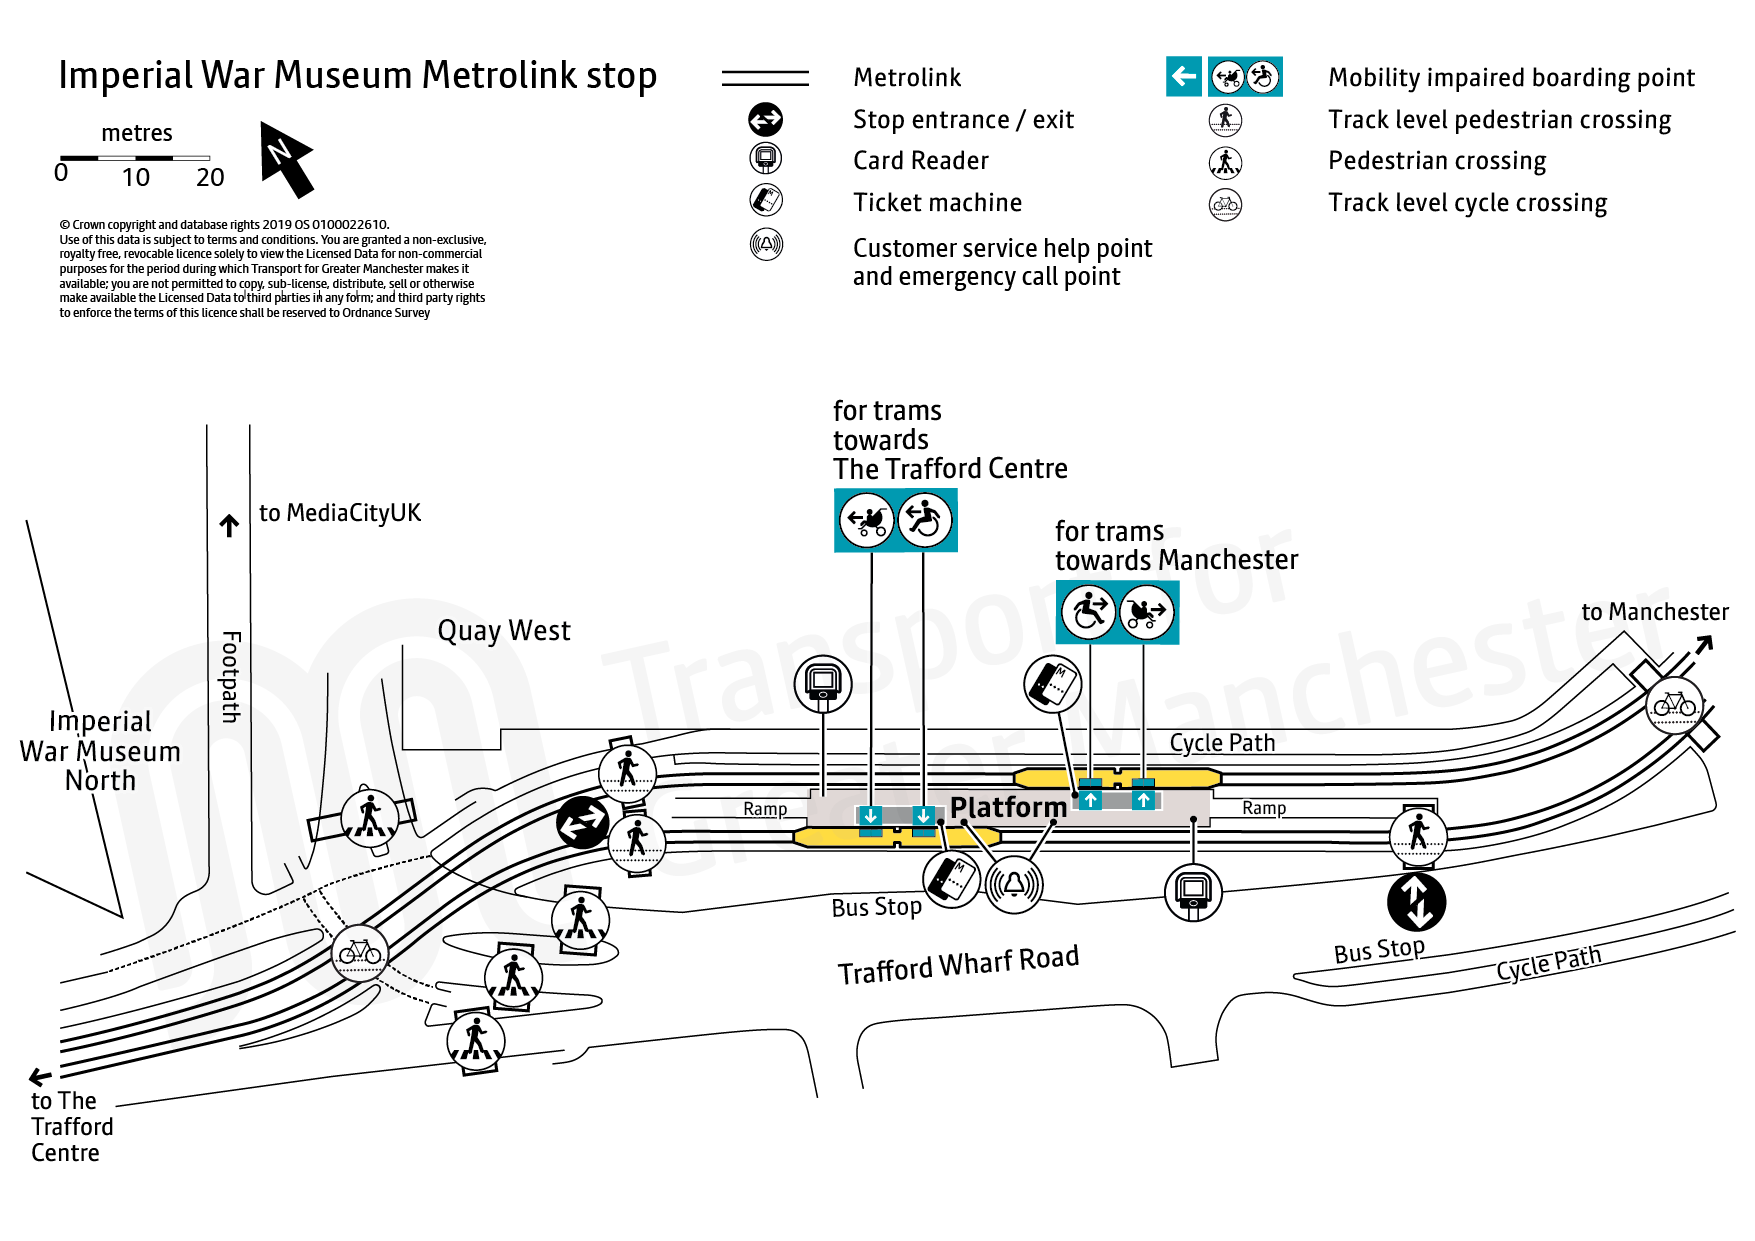 Stop map for Imperial War Museum tram stop